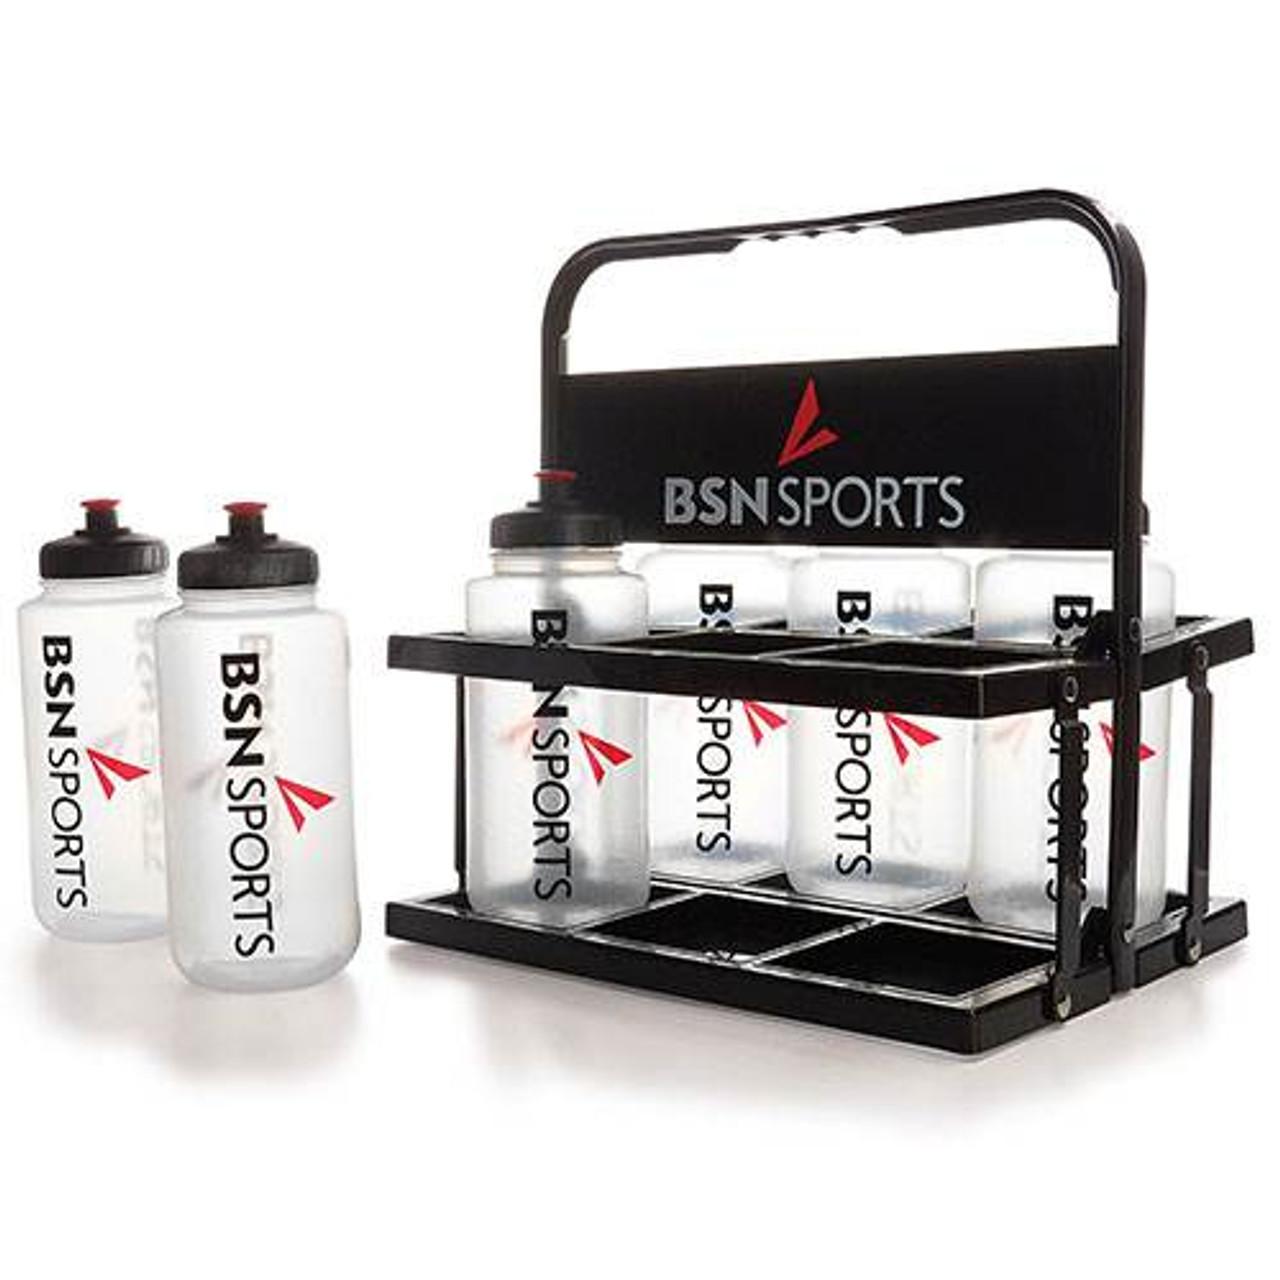 BSN SPORTS™ Foldable 6-Bottle (6 Qt.) Carrier